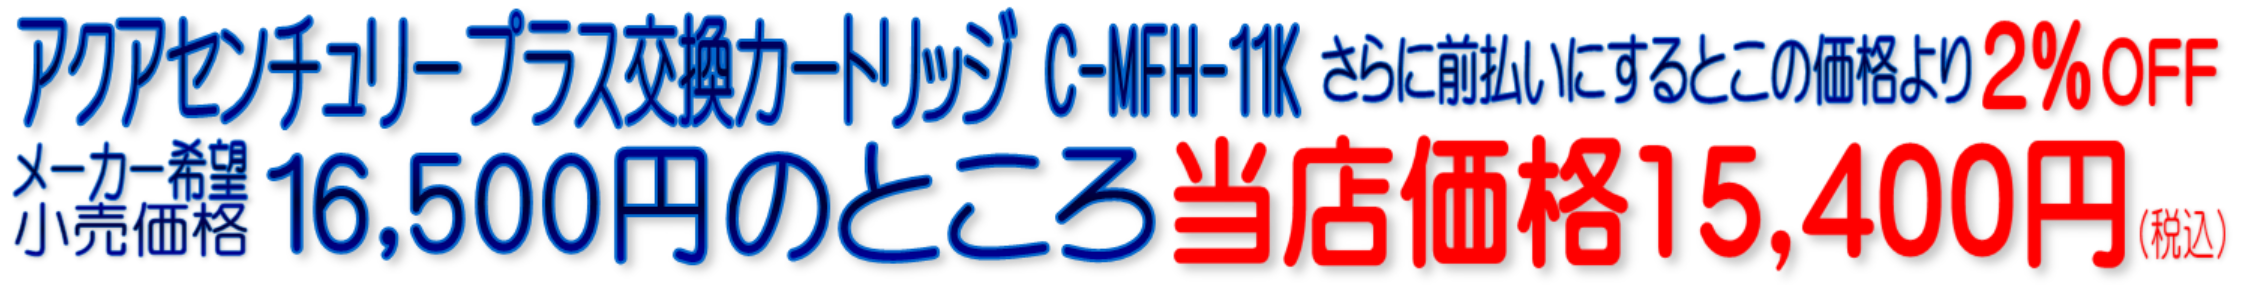 MFH-51AS C-MFH-51AS アクアセンチュリー